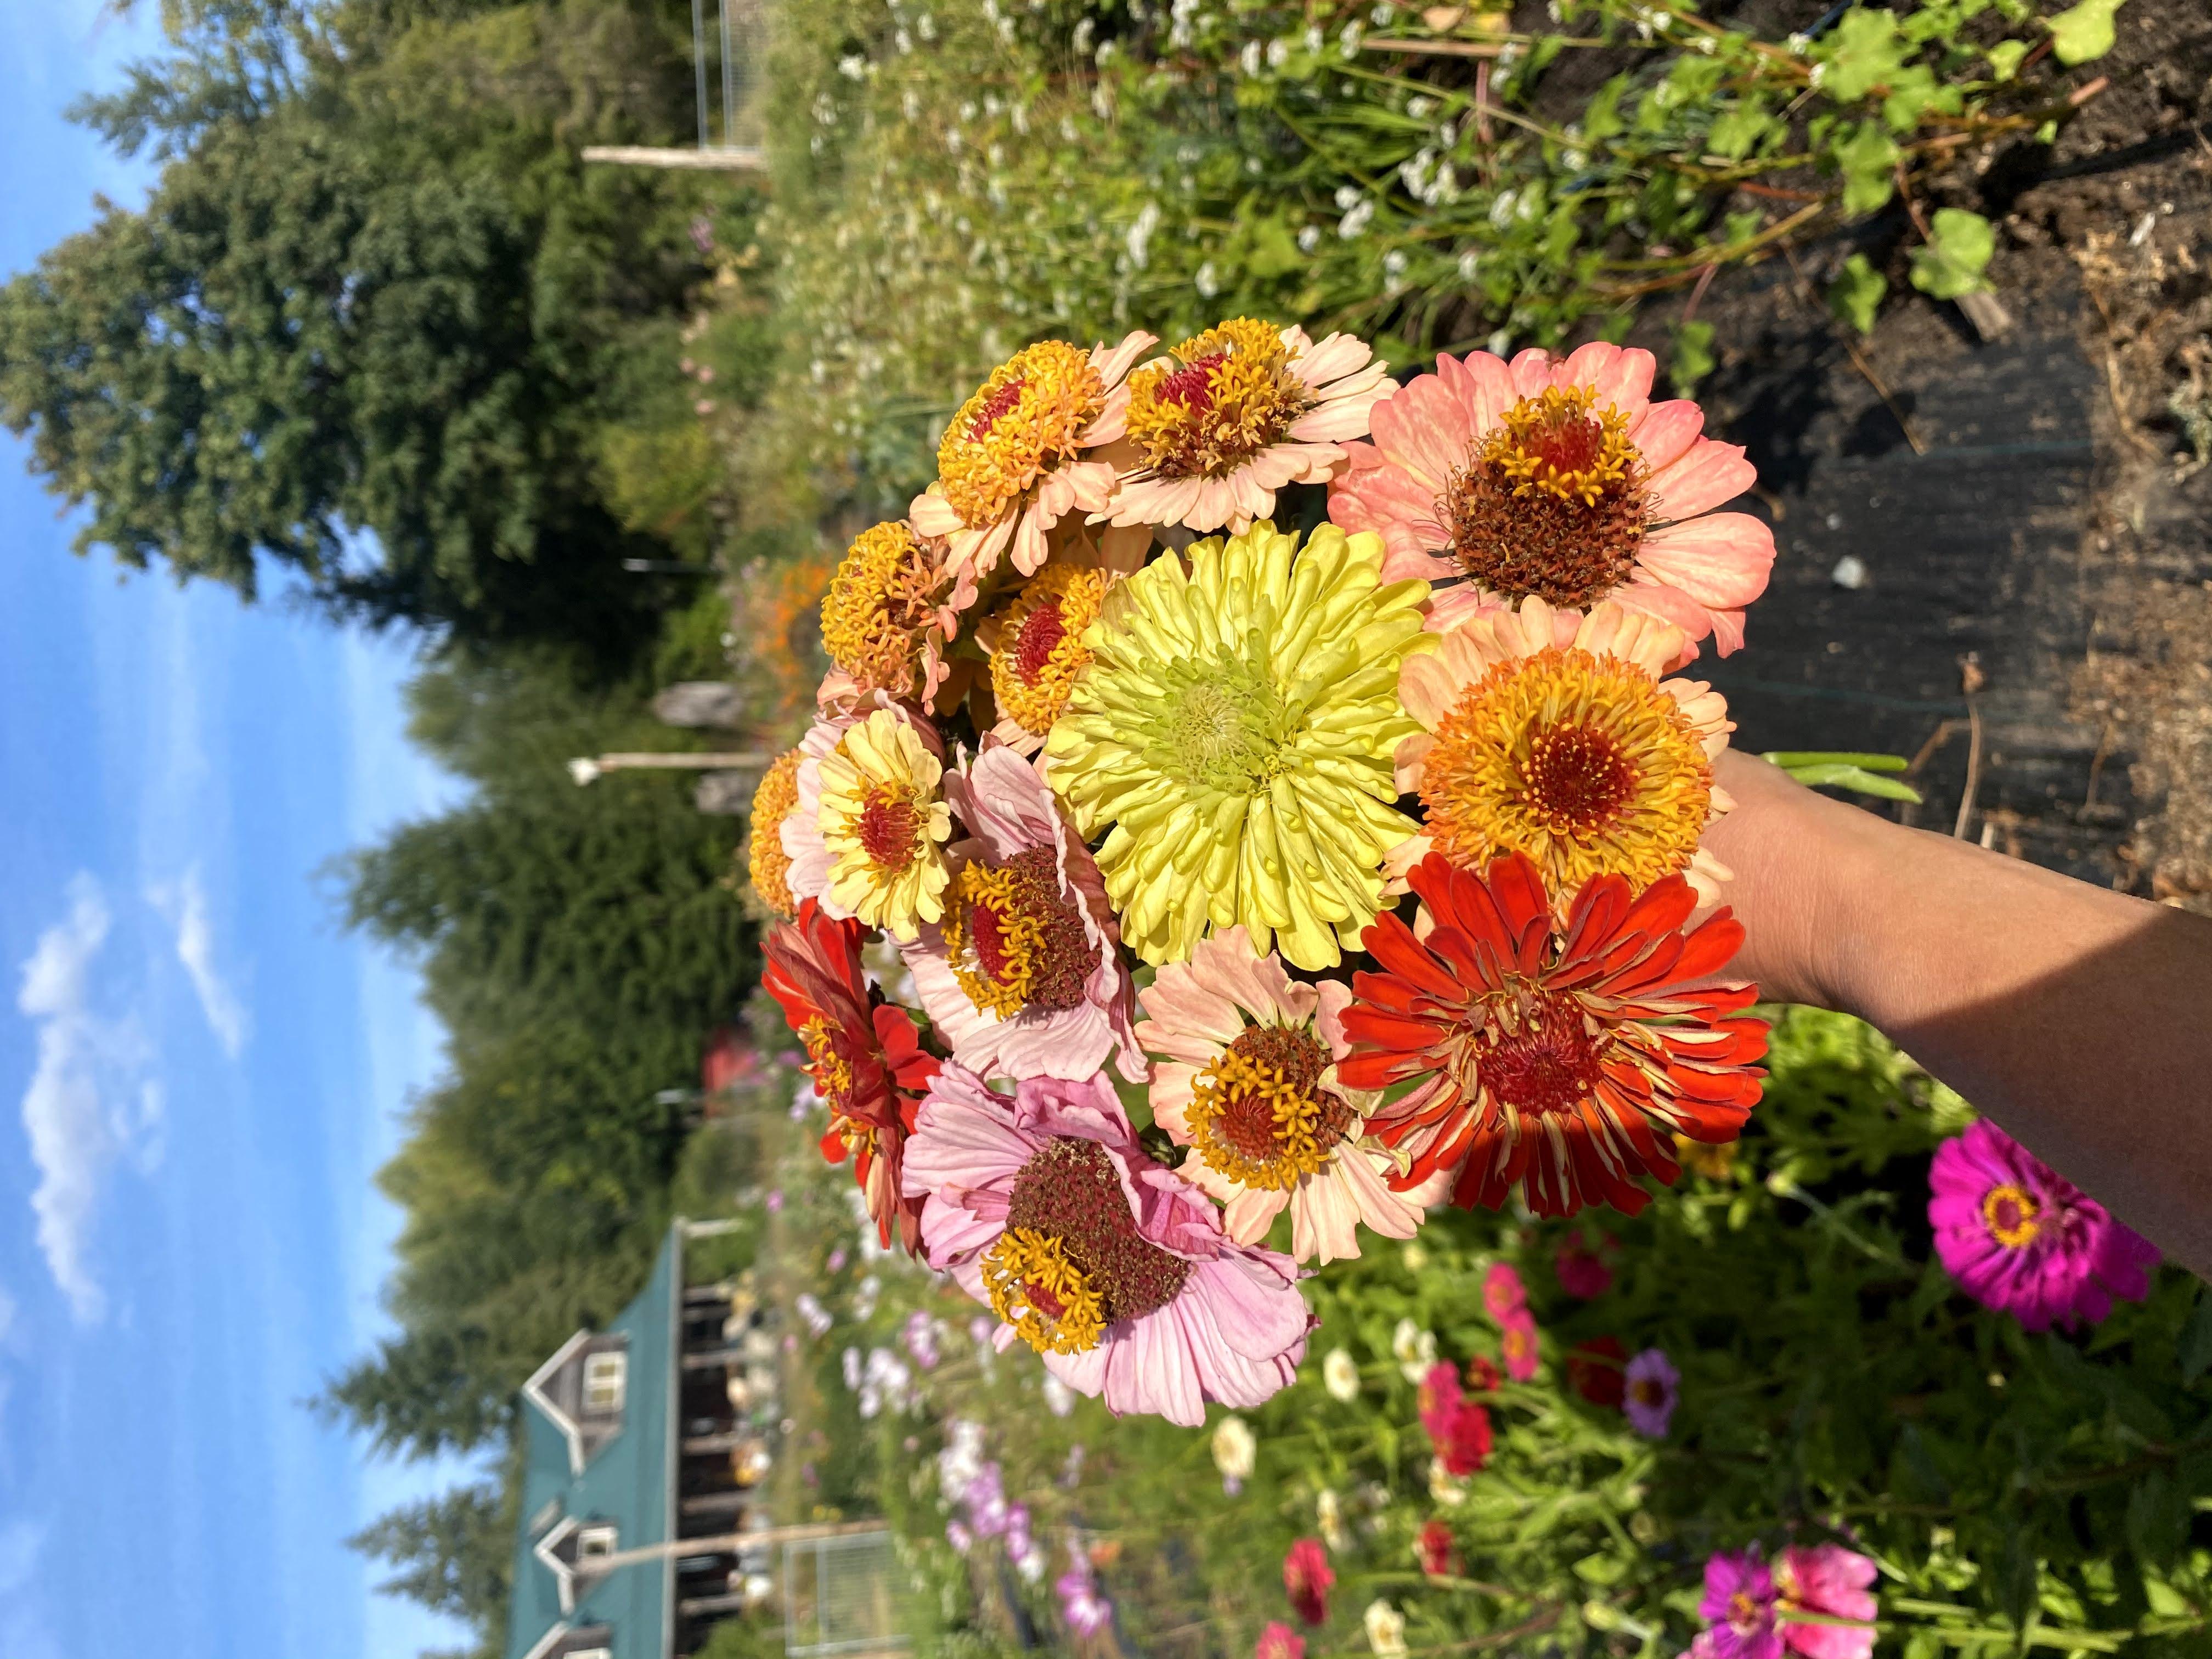 Perigee Farm Flower Share